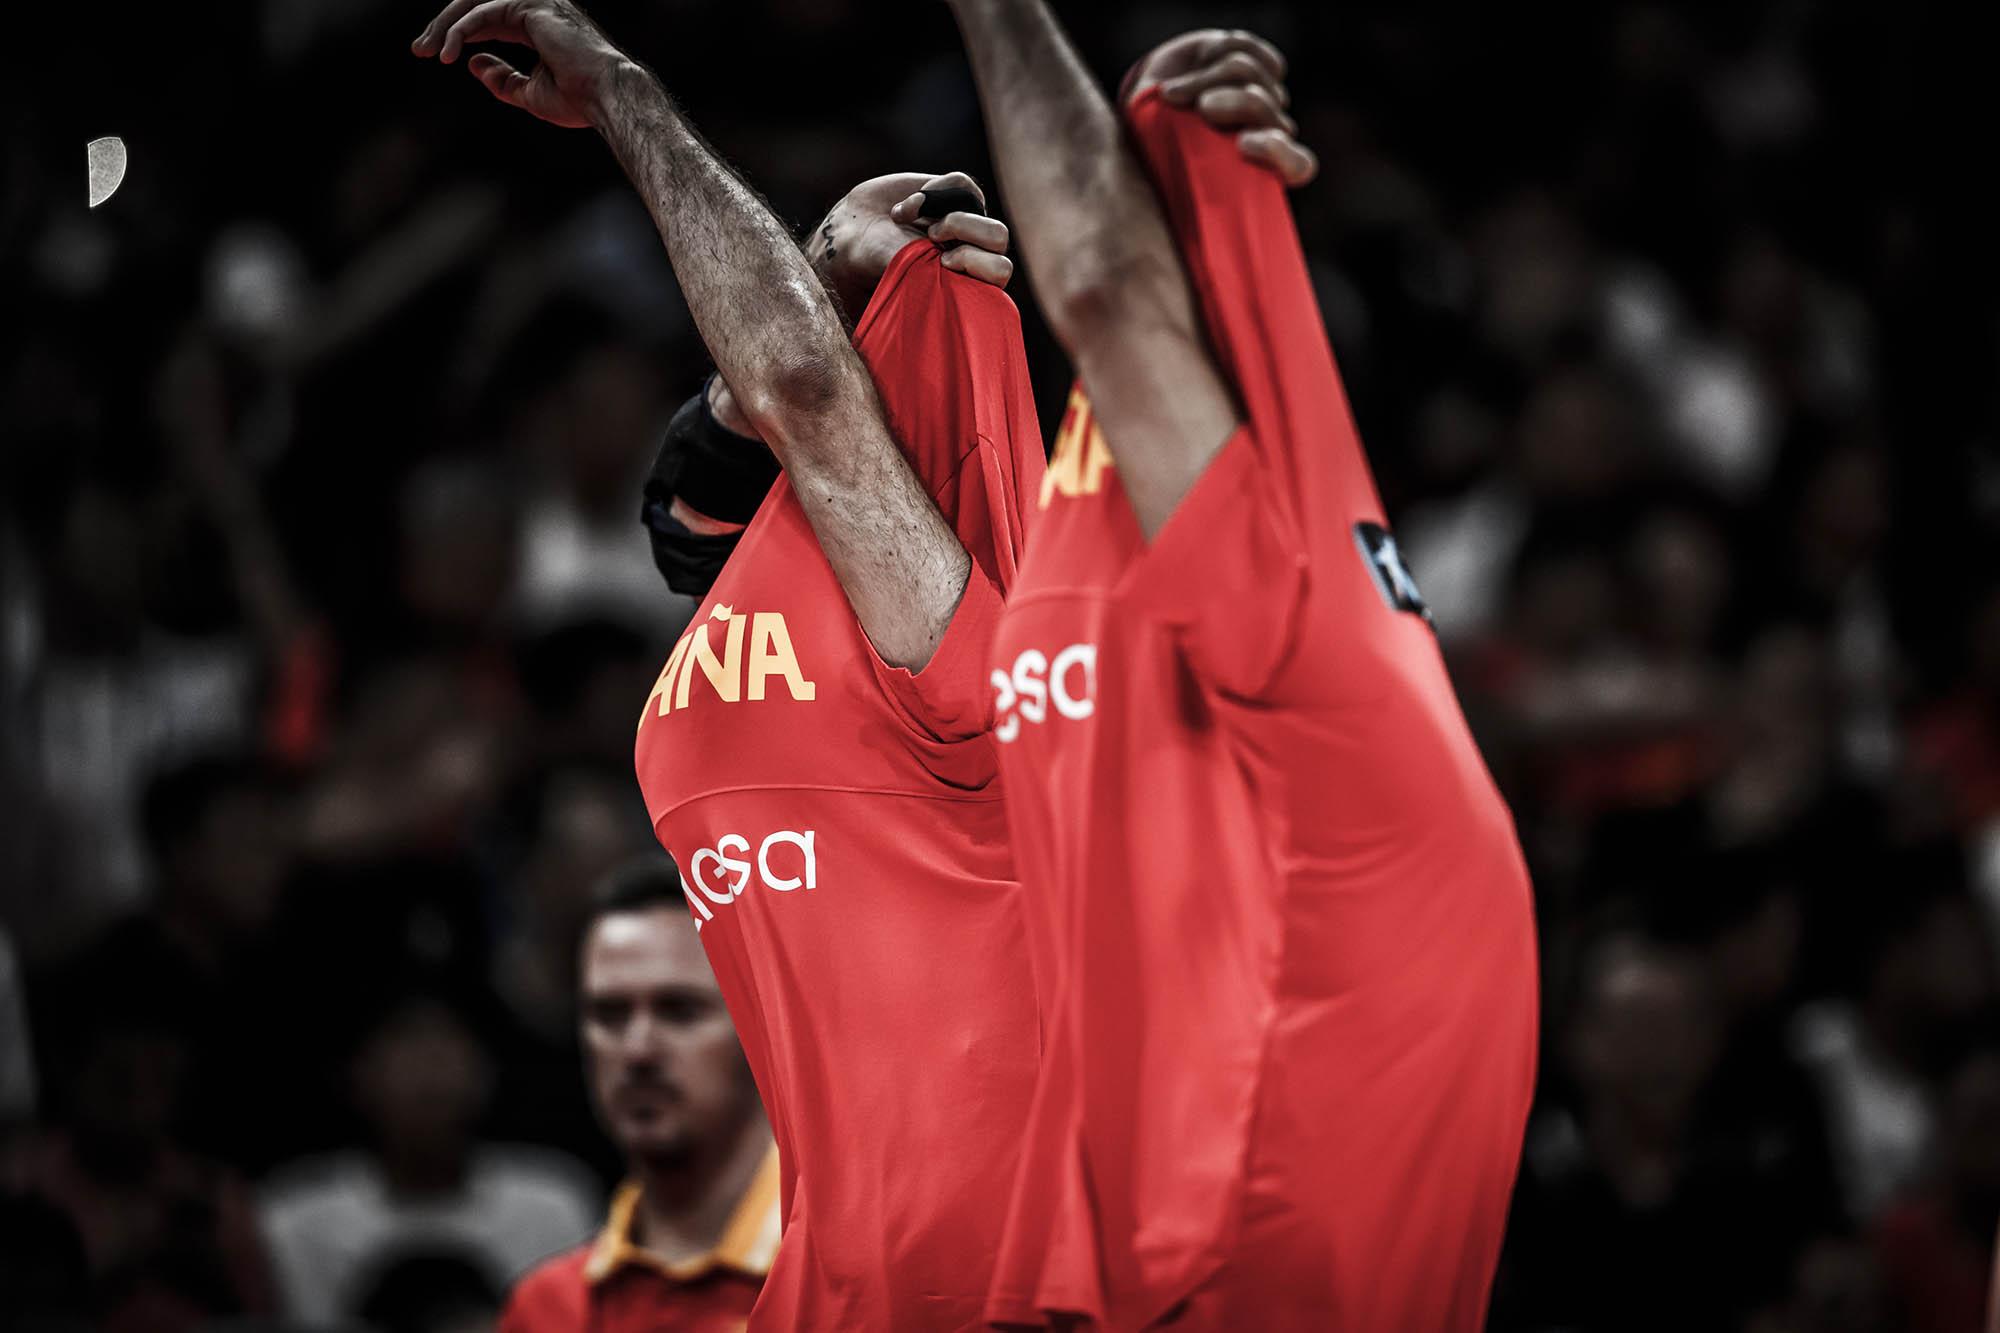 Spain getting ready